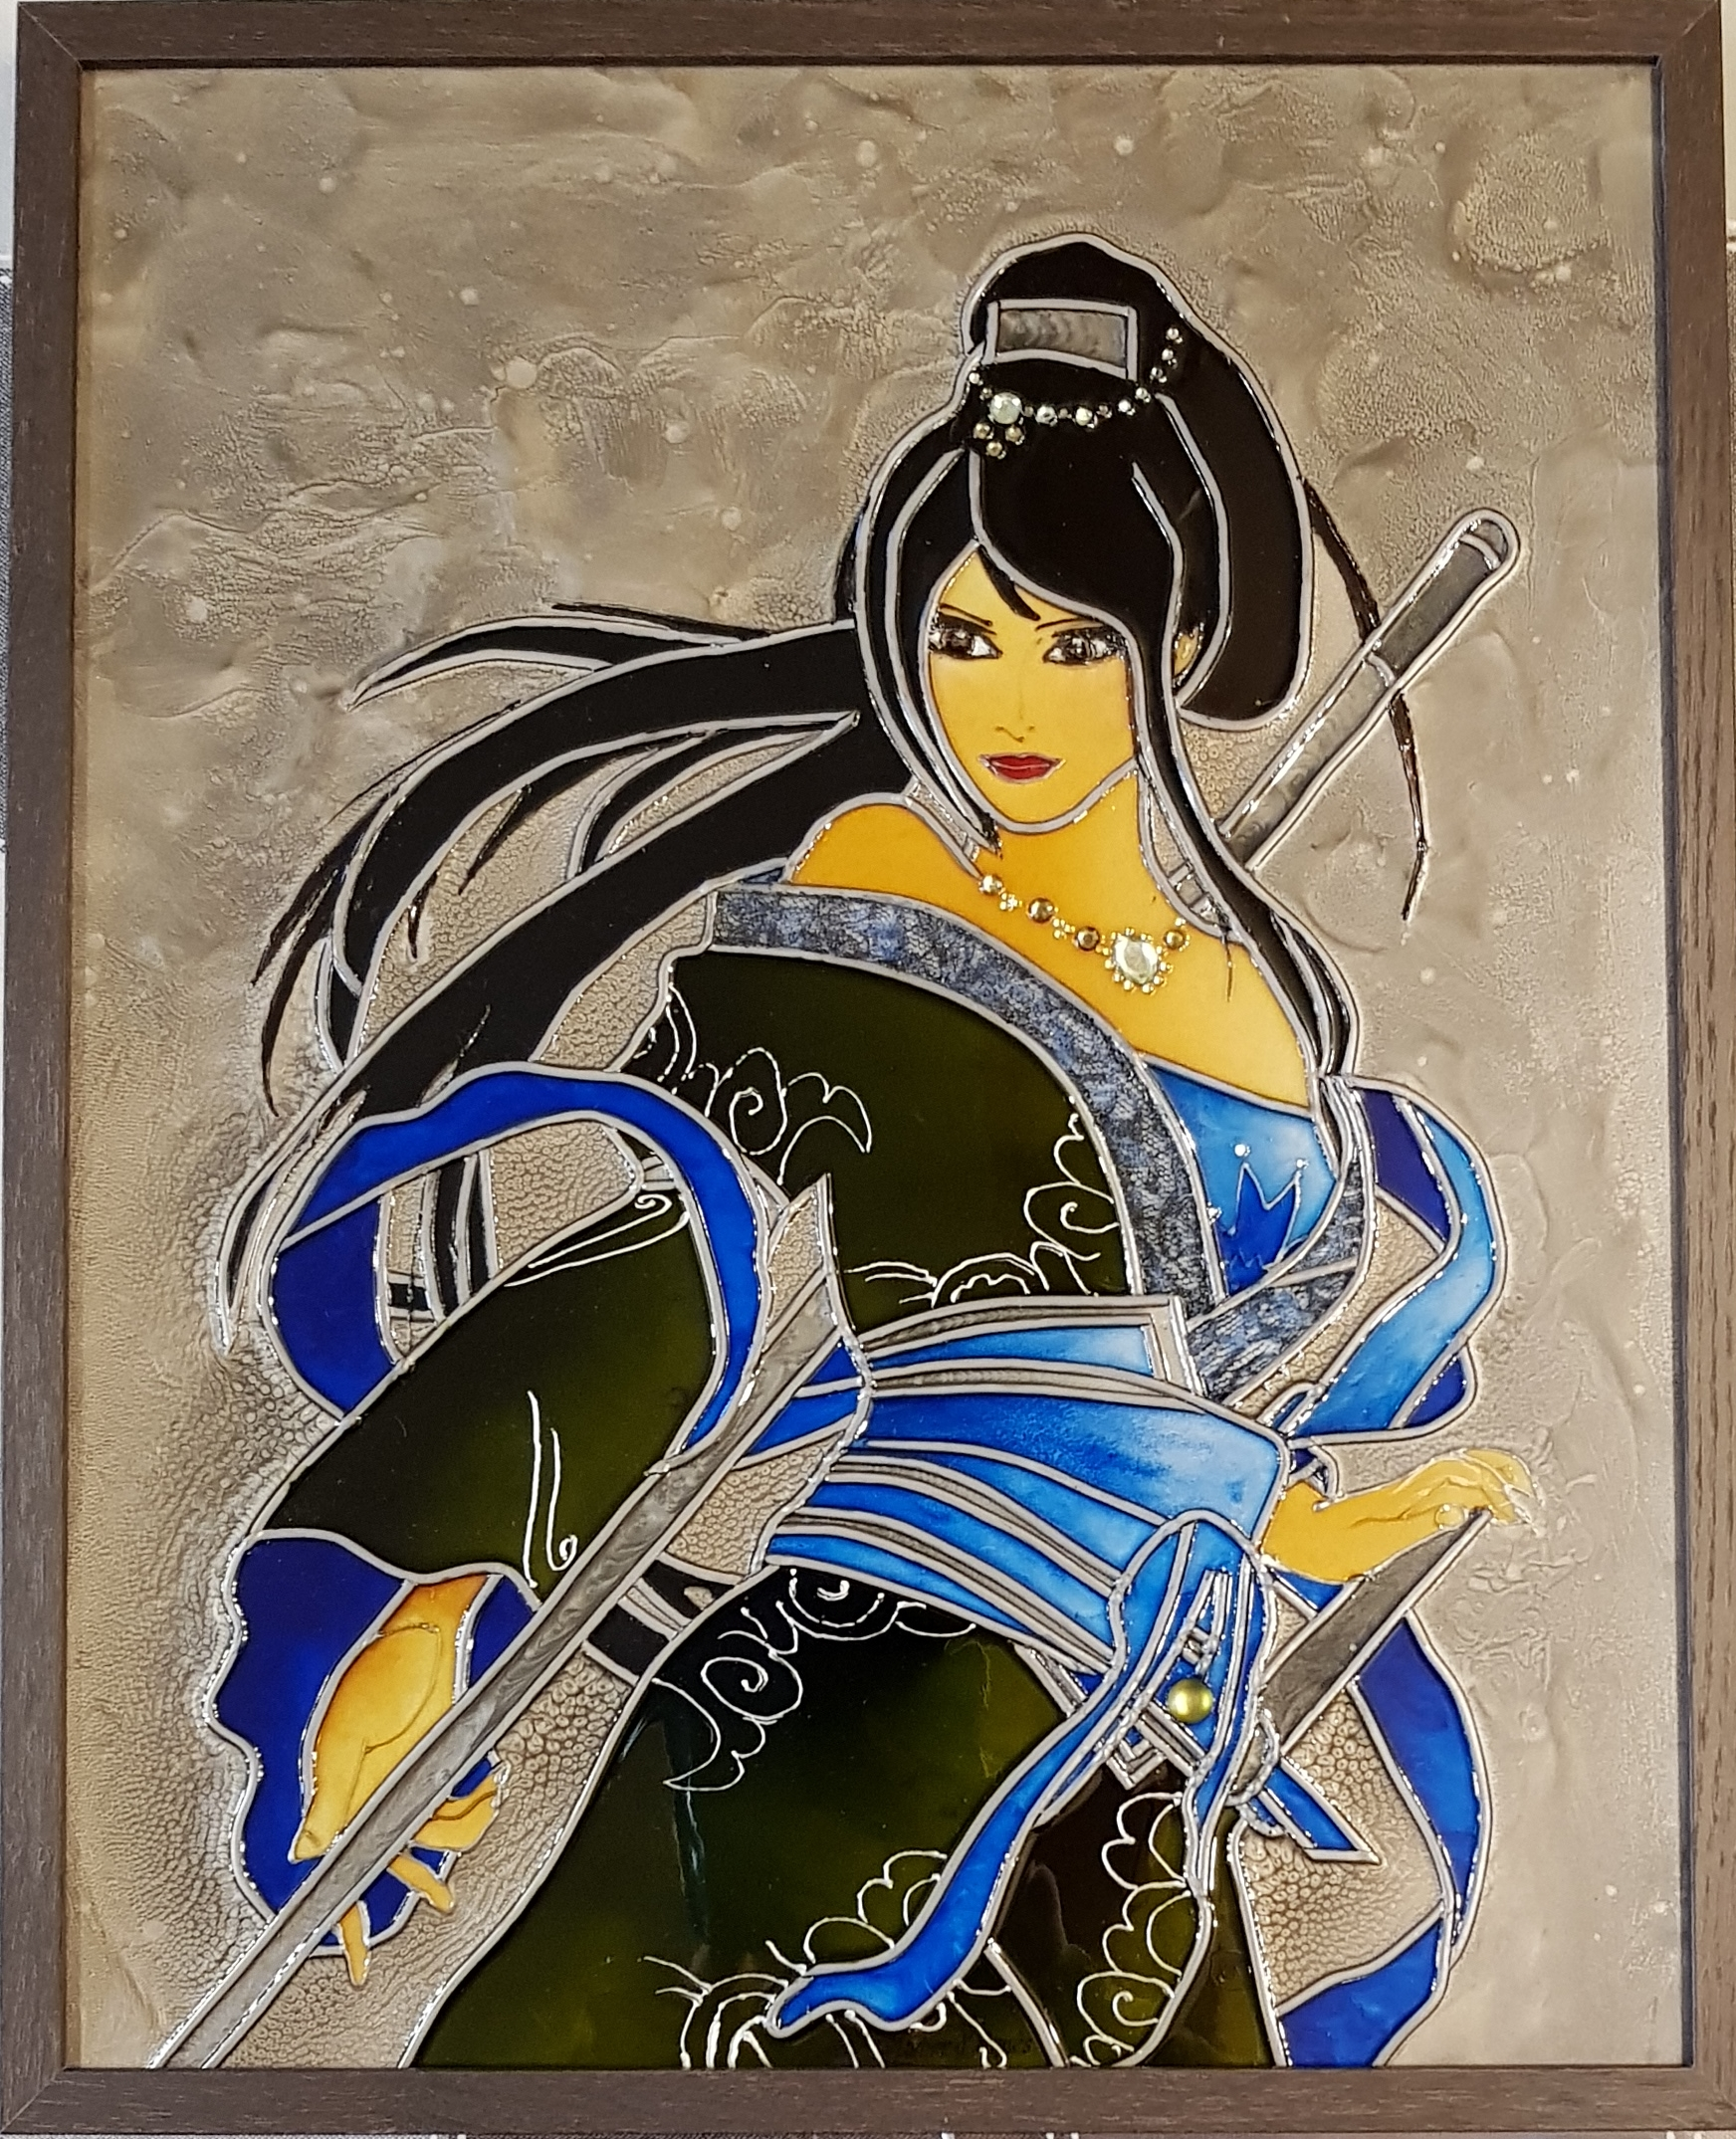 Mademoiselle Wakizashi